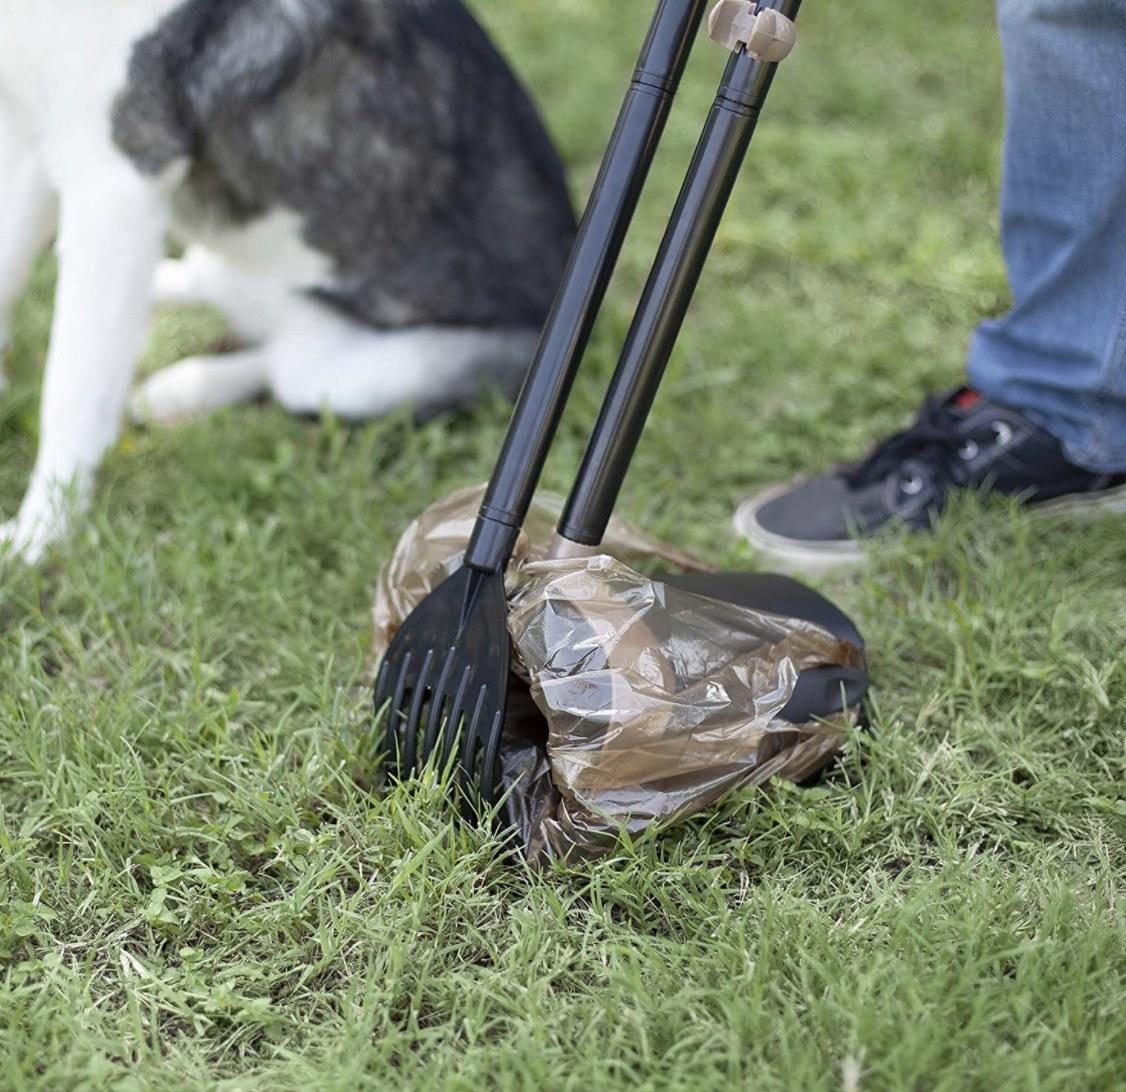 Model utilizing pooper scooper to clean up grass